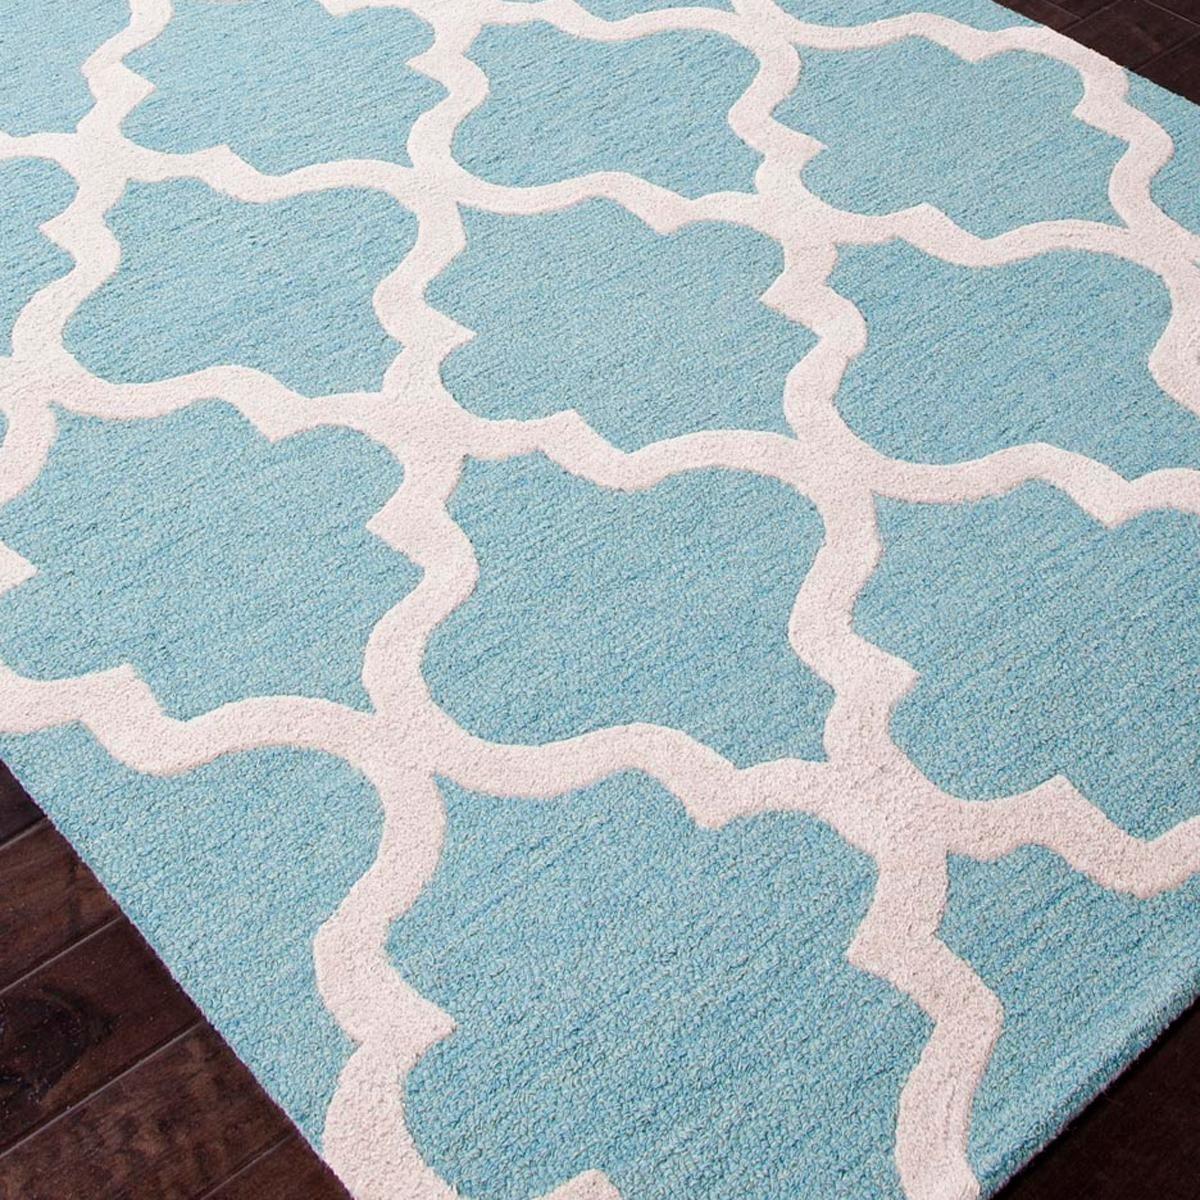 Tudor Window Grill Plush Wool Rug | Wool rug, Plush and Window